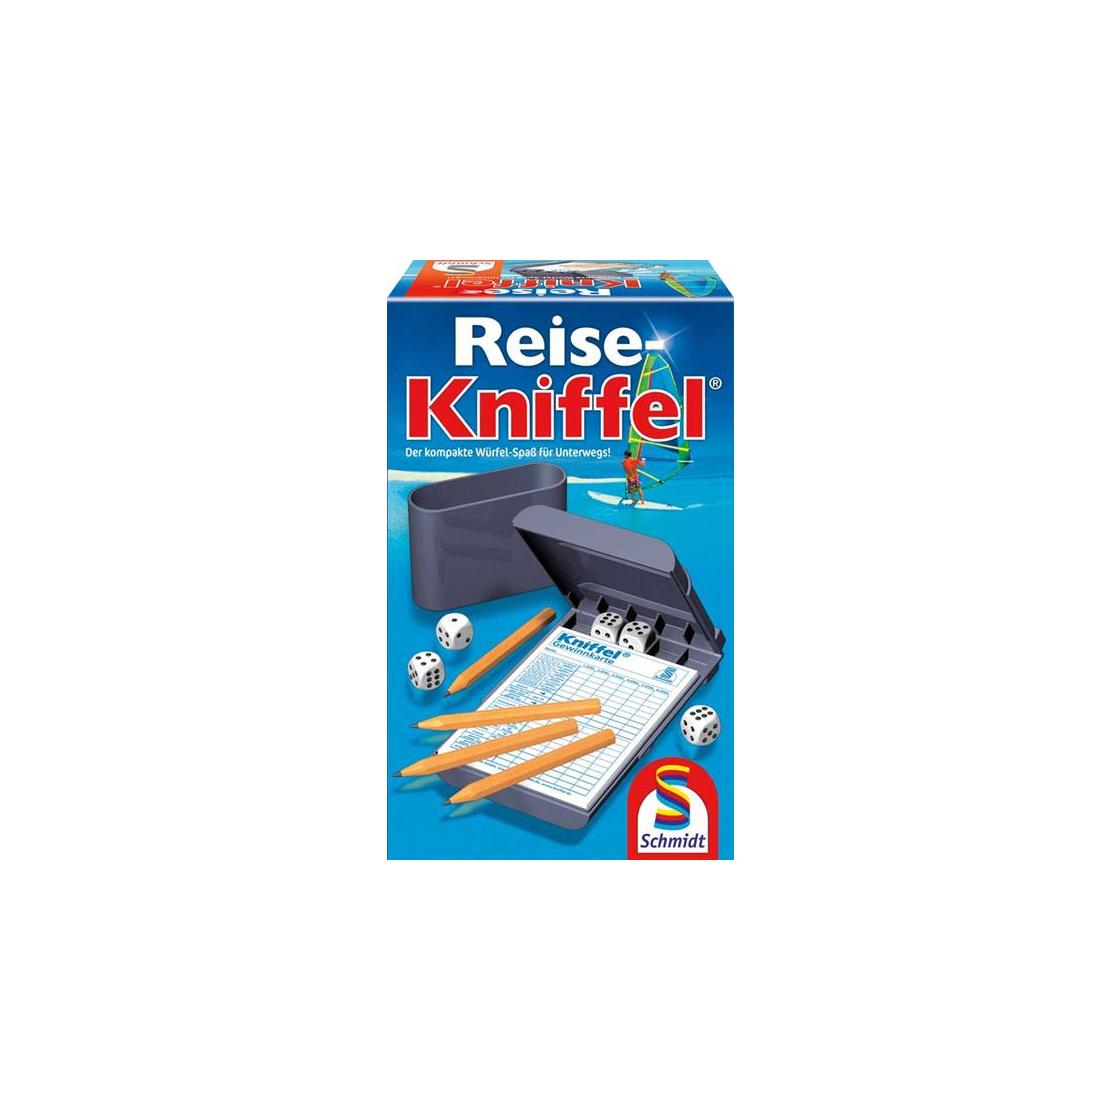 Kniffel Schmidt Spiele Kostenlos